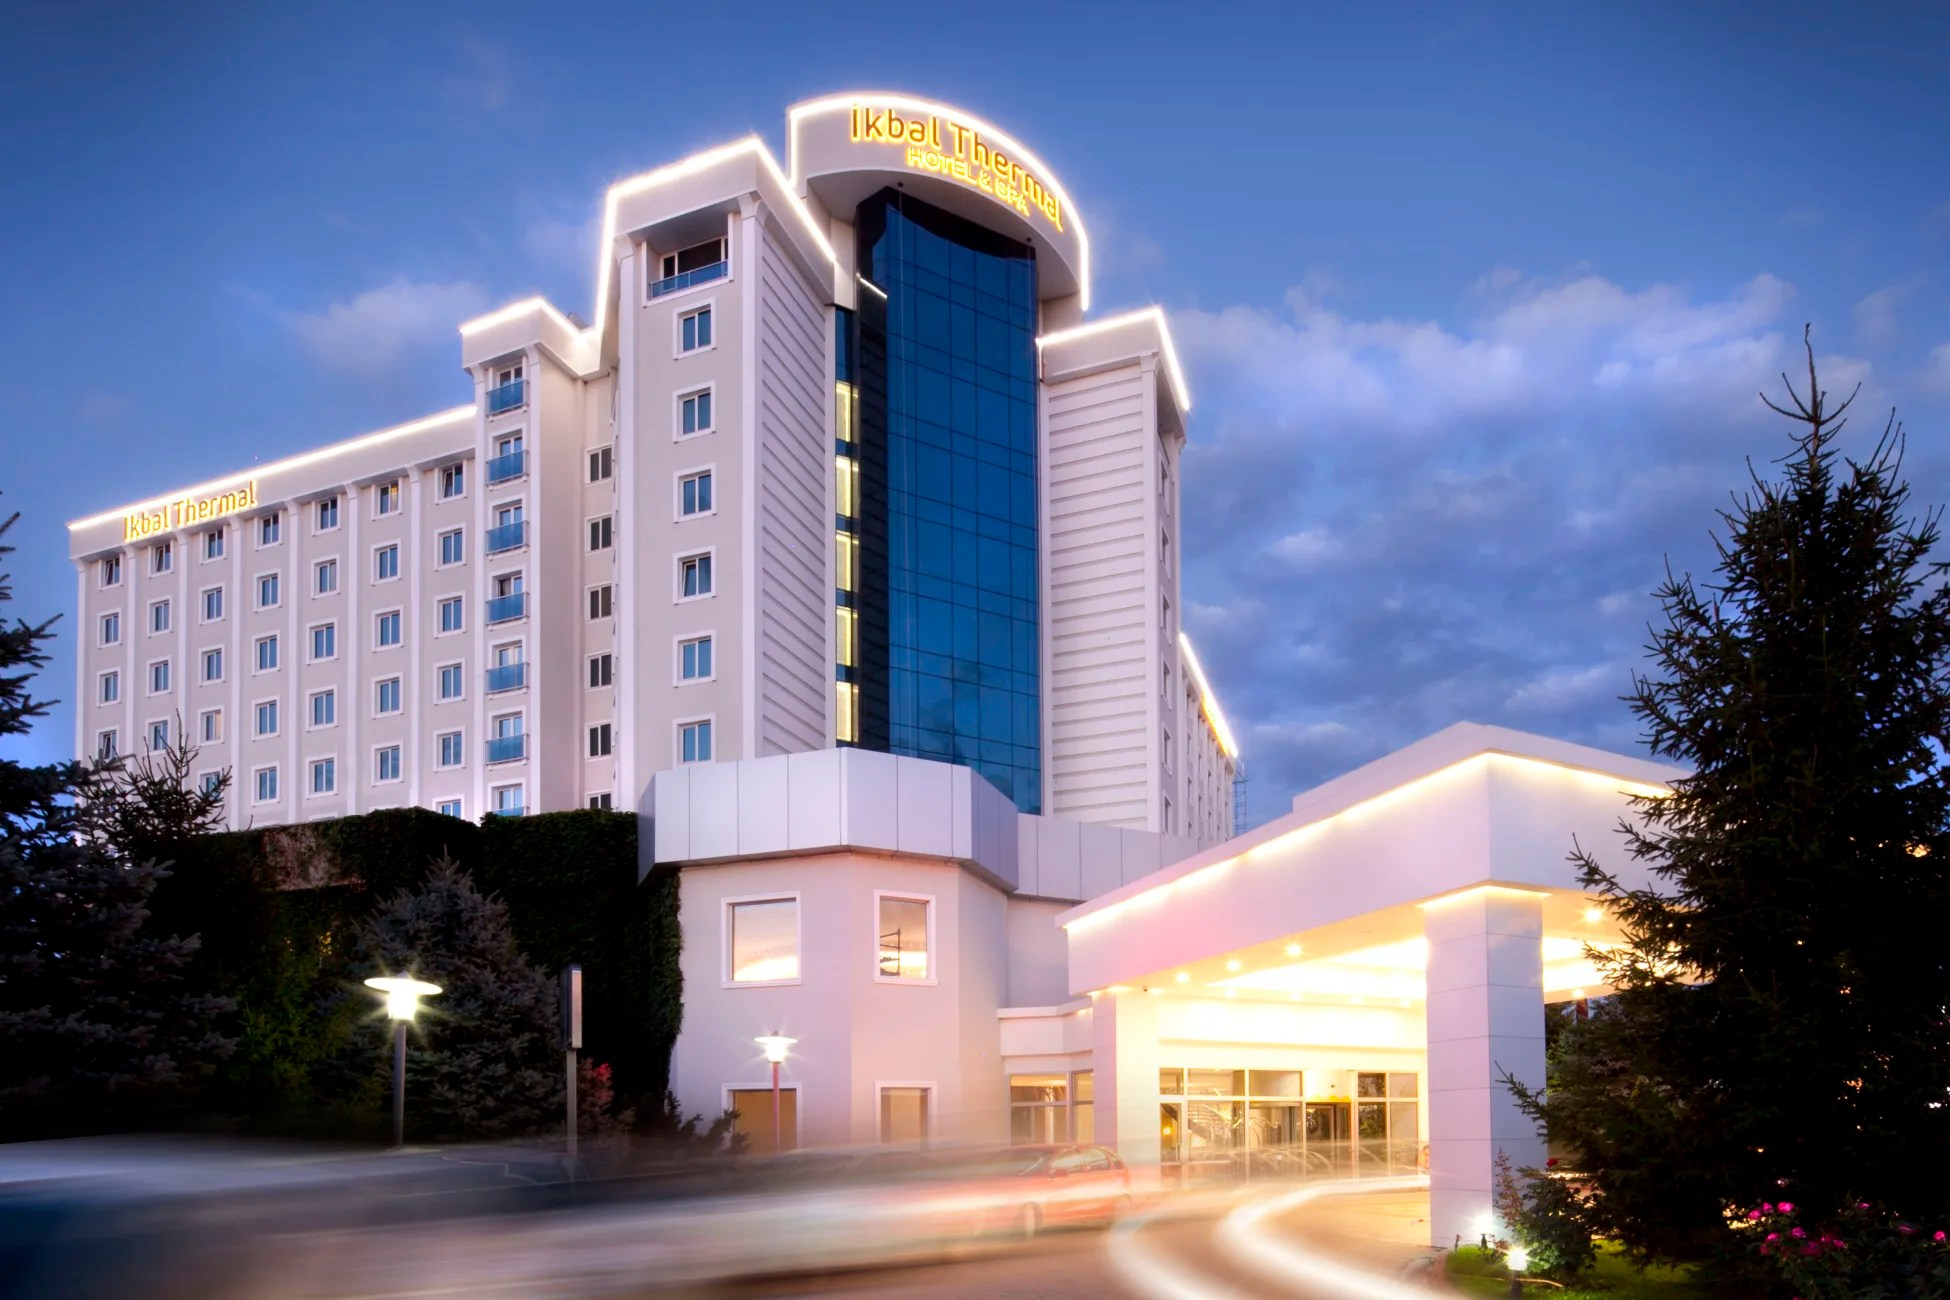 Hotel Ikbal Thermal Hotel Spa Afyon Trivago Com